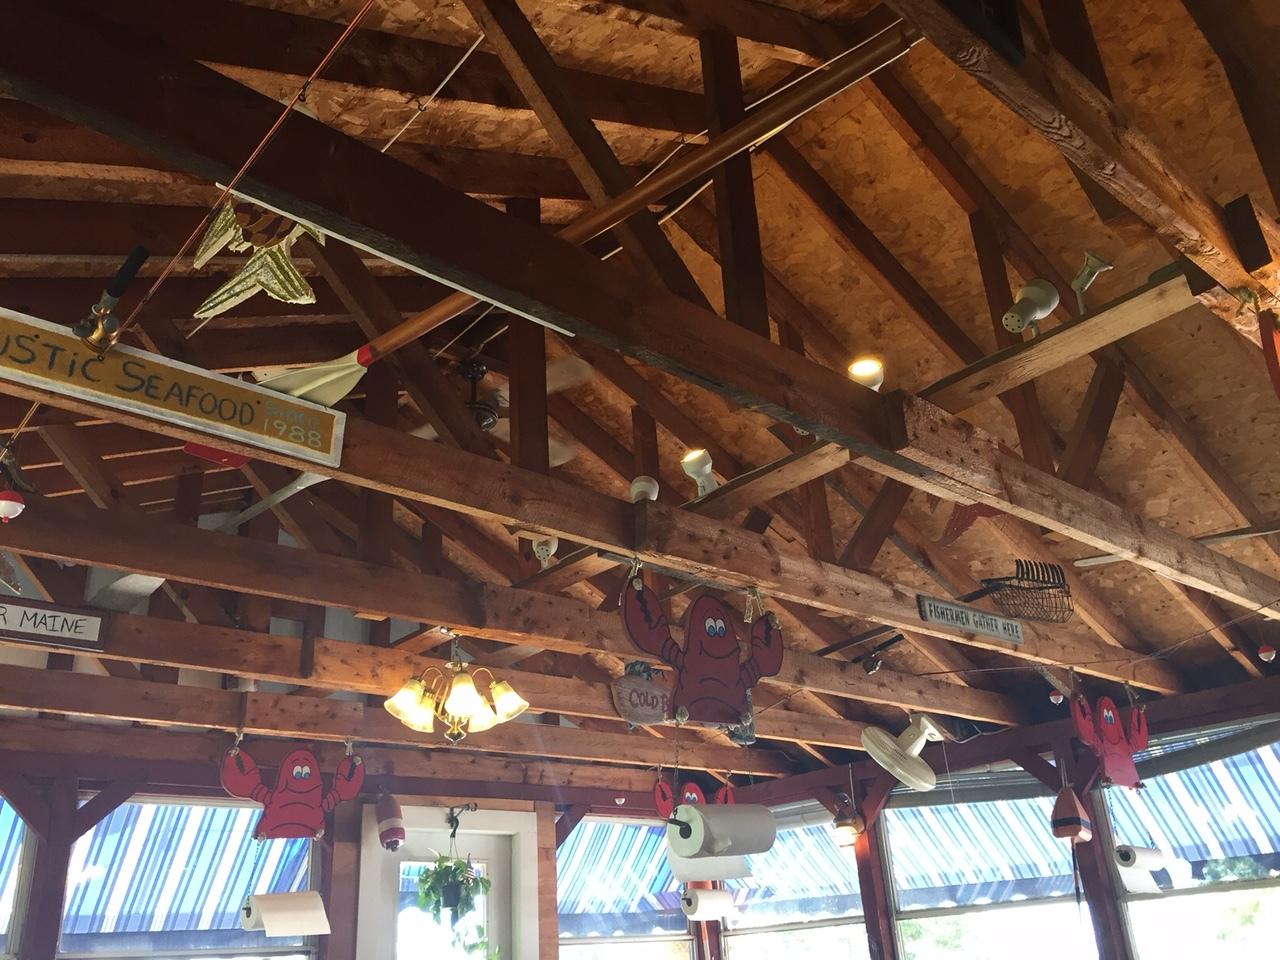 Plenty of Lobster Paper Towels!